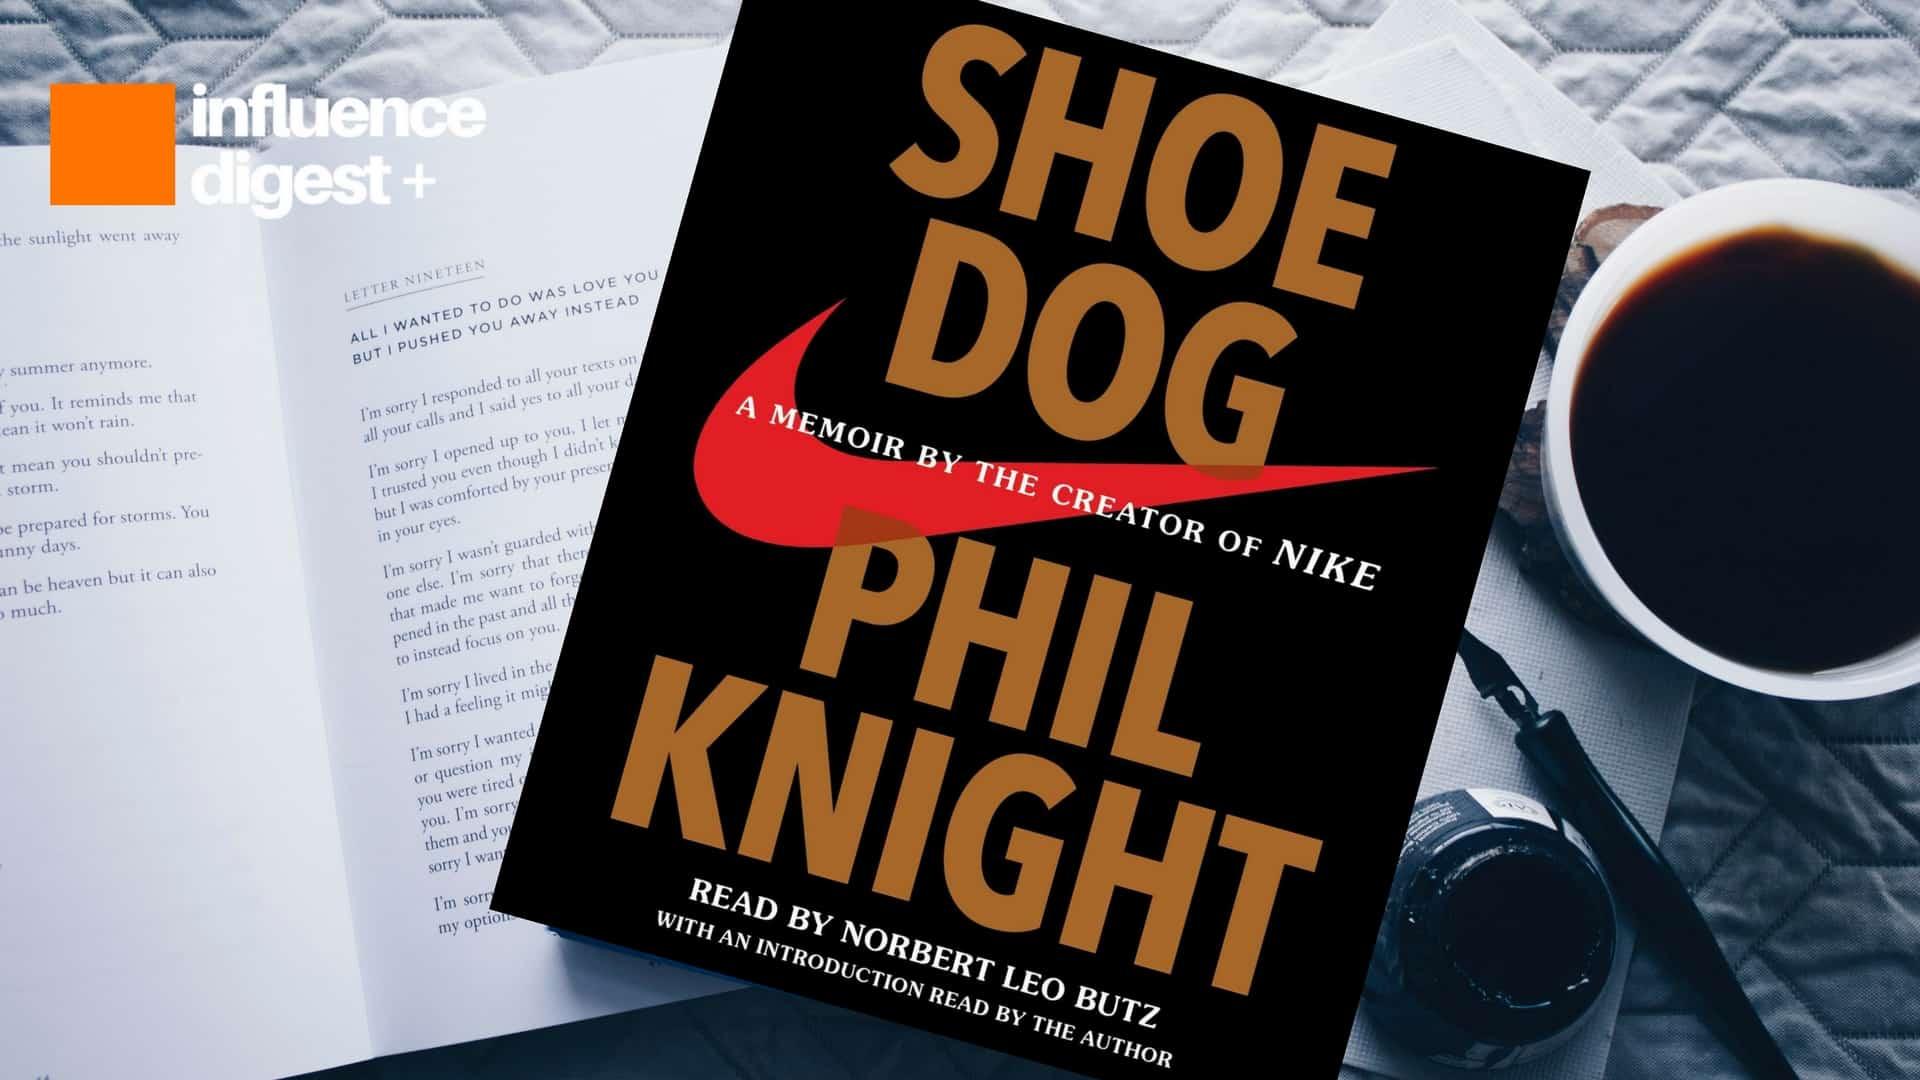 9c7d82ecc3f14e Summary -  Shoe Dog Phil Knight Norbert Leo Butz 9781508211808